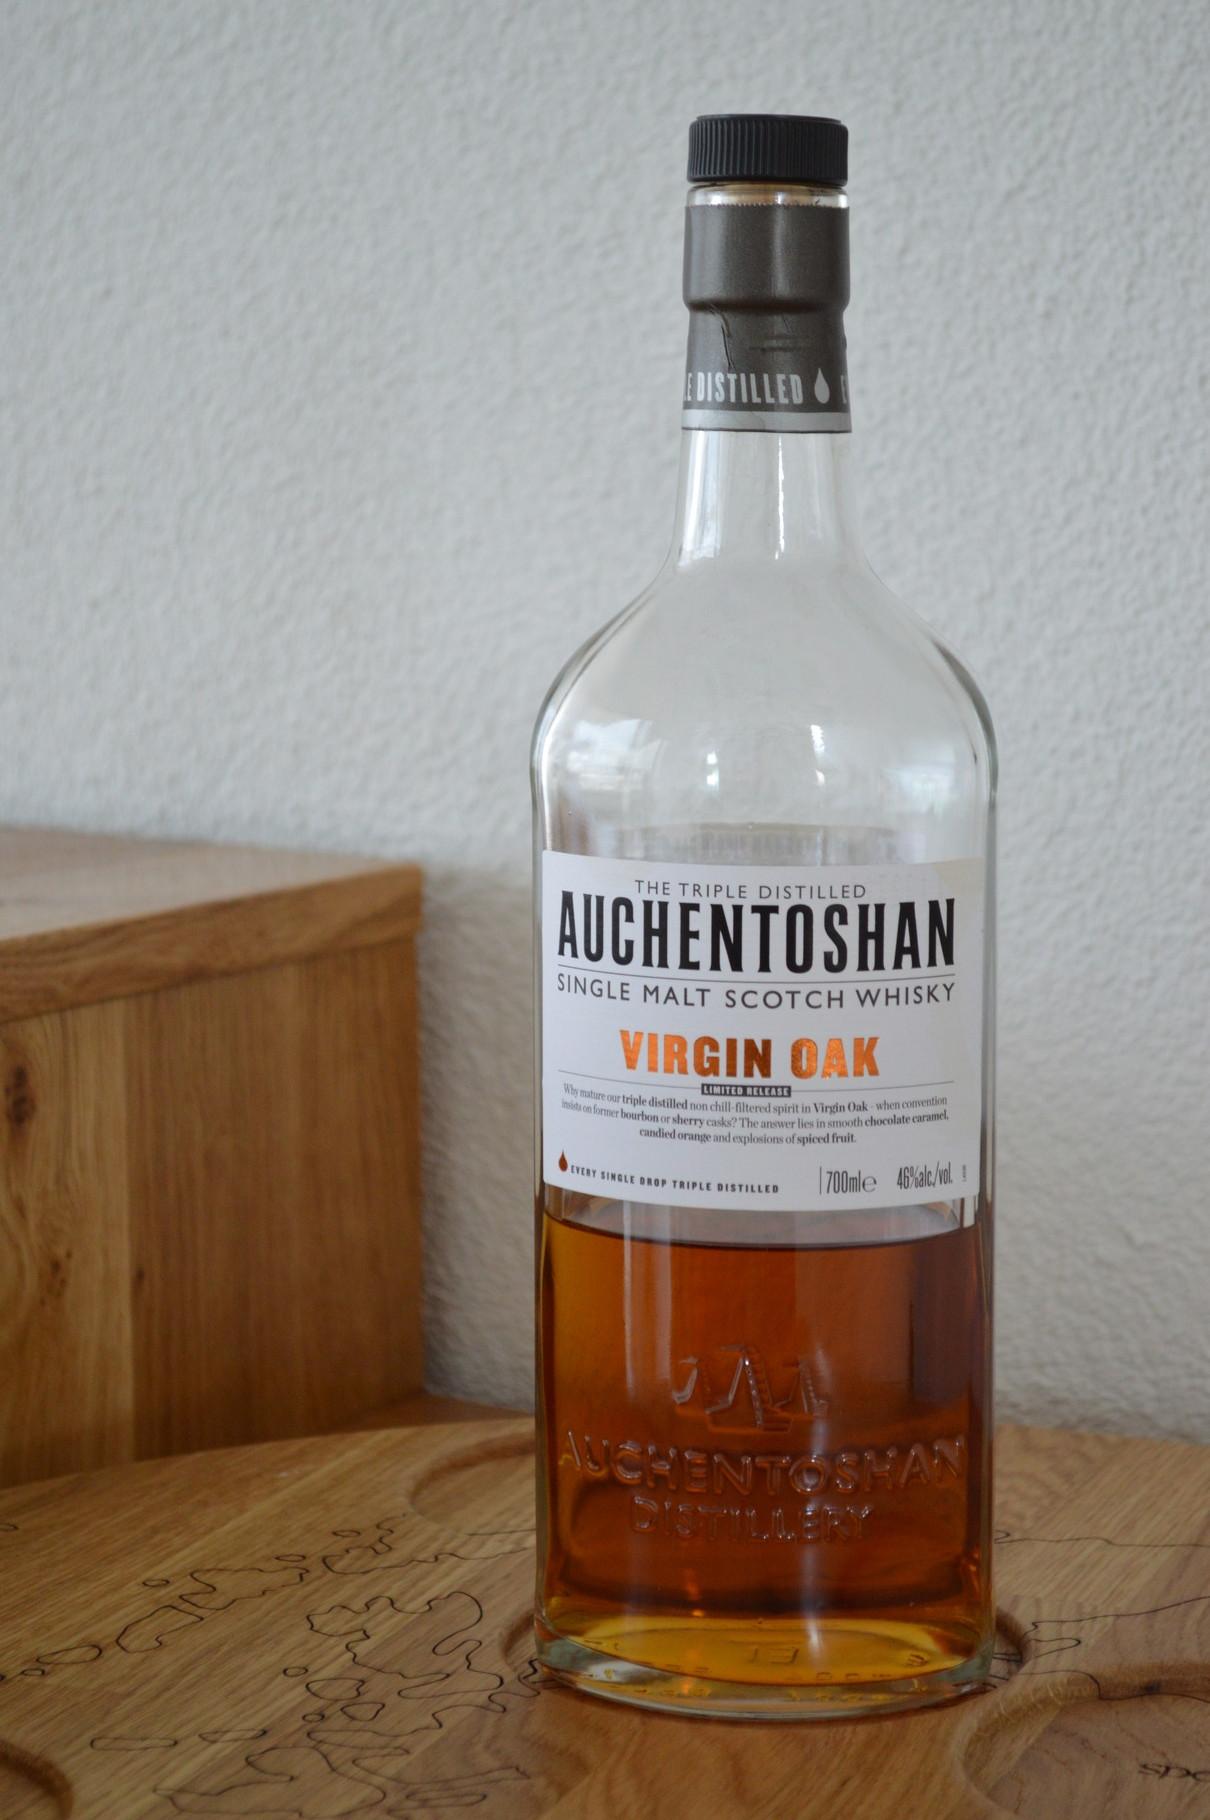 LOWLANDS - Auchentoshan* - Bottler: Original - 70cl - 46% - Virgin Oak